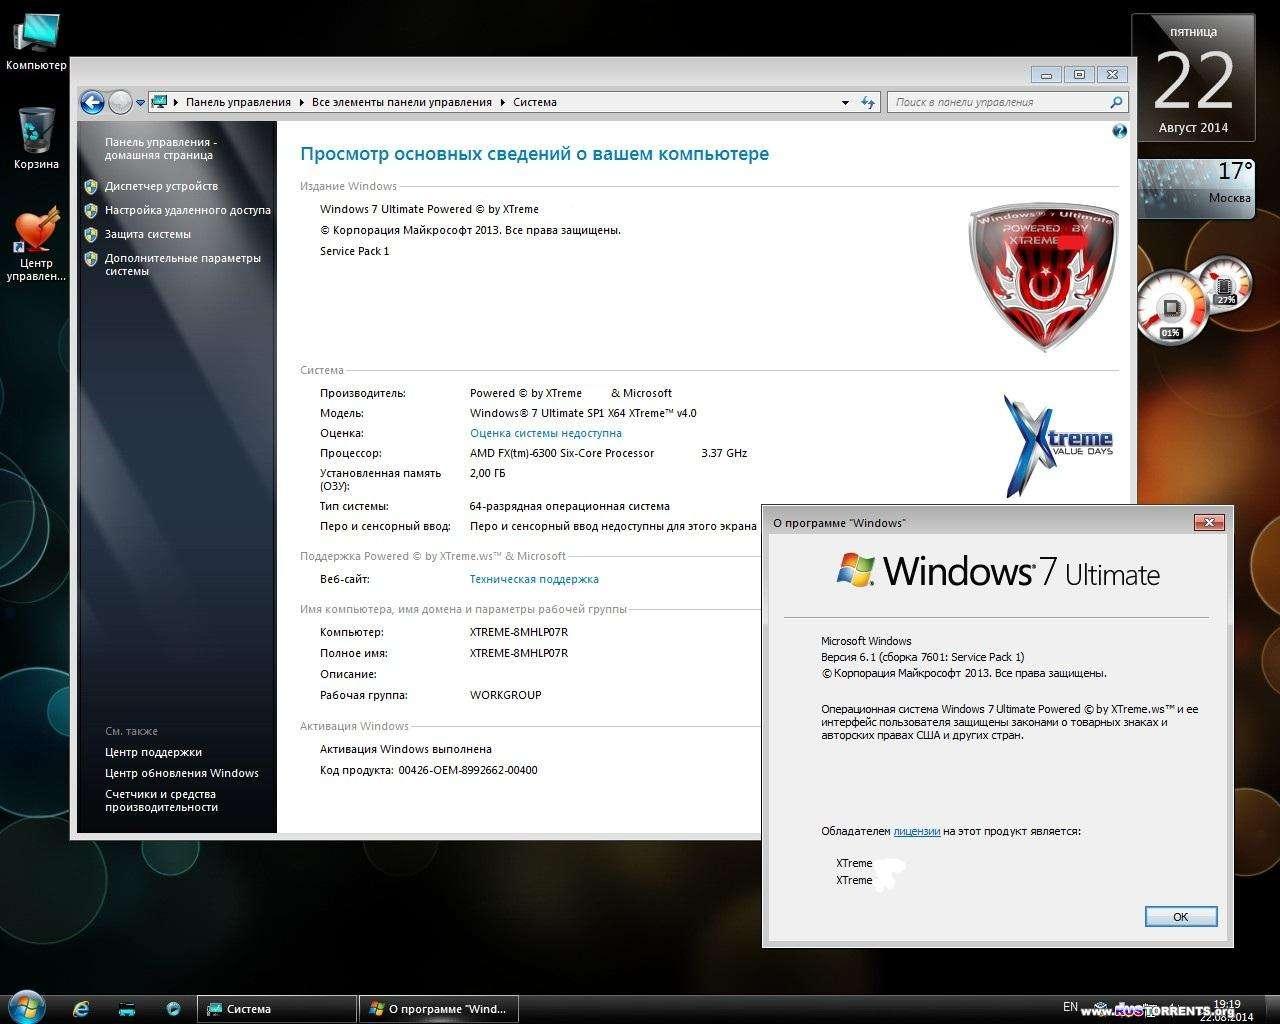 Microsoft Windows 7 Ultimate SP1 X64 + WPI Lite XTreme v4.0 (Август 2014 г.)